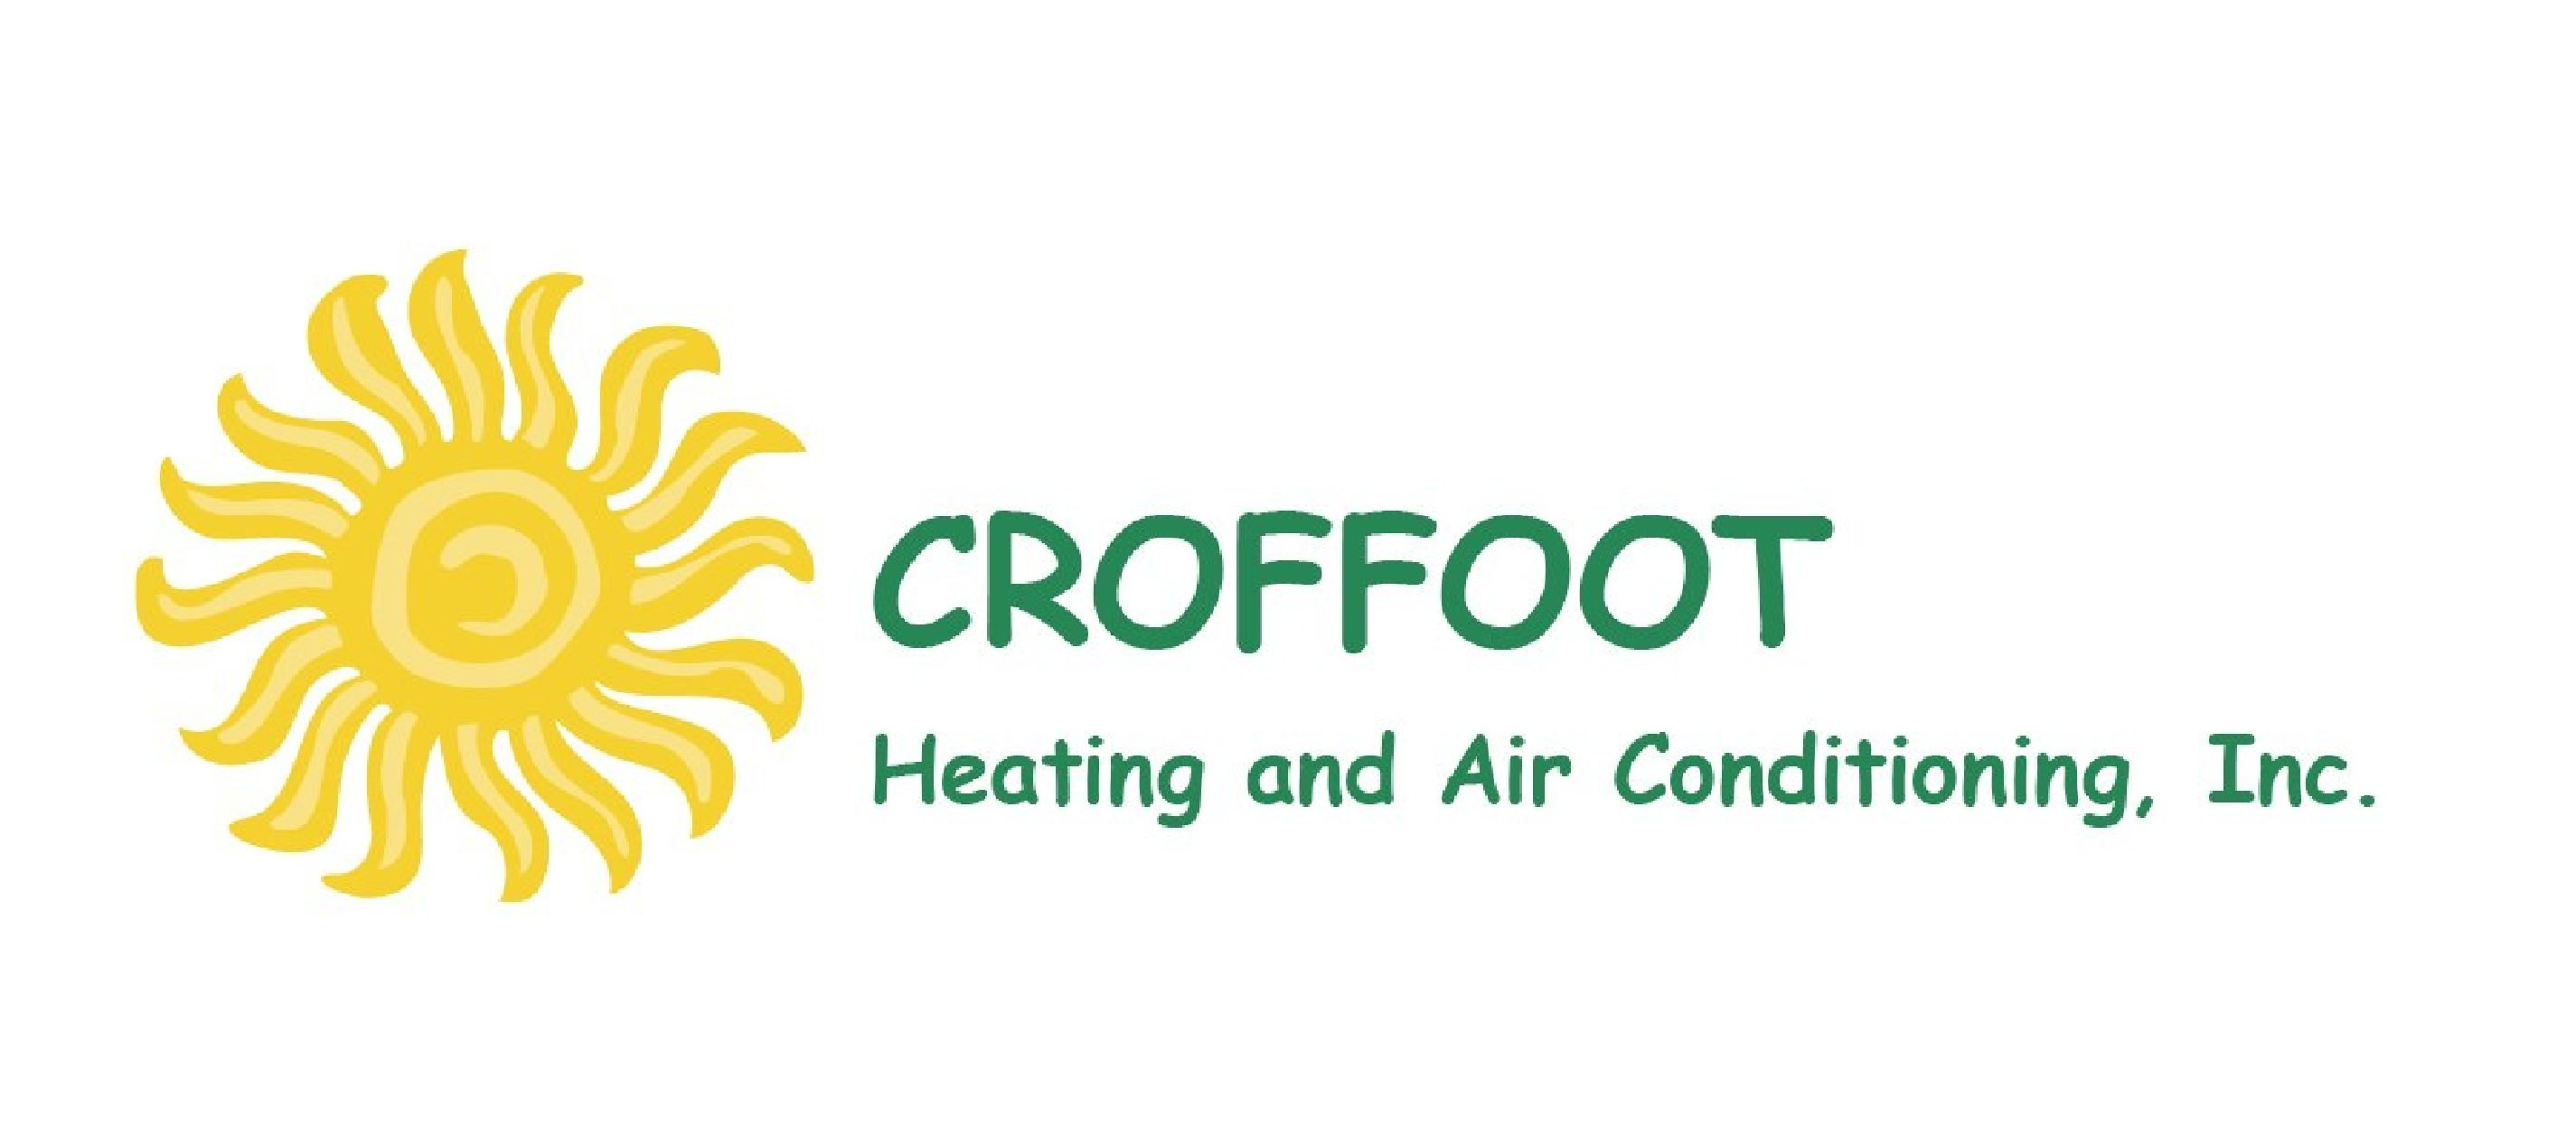 Croffoot Heating & Air Conditioning Inc logo